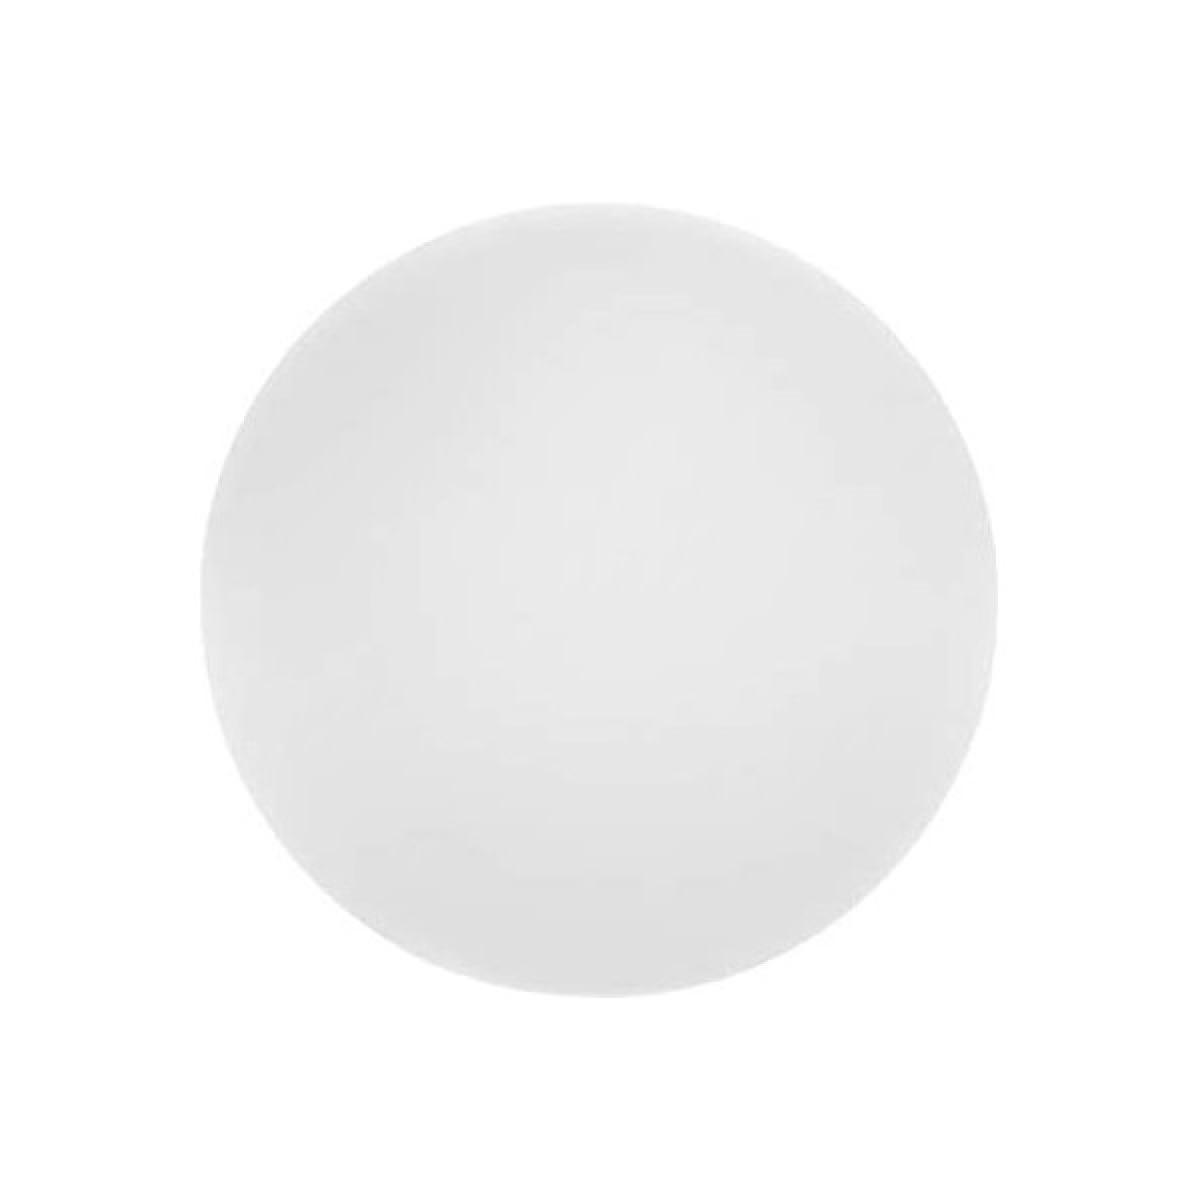 Unknown LED Ledkia A++ 1 W (Blanc froid 5700K - 6200K)